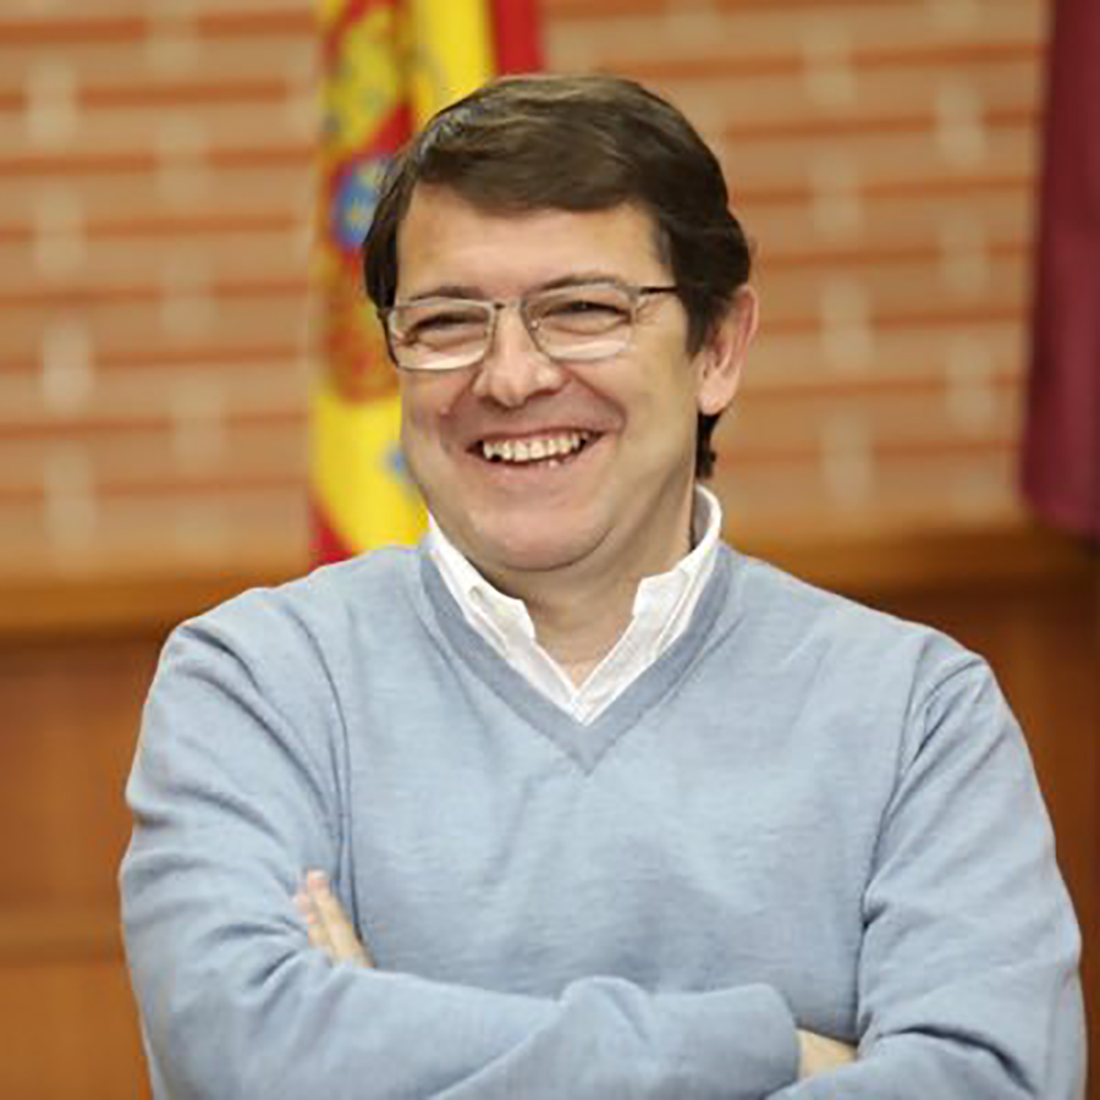 Alfonso Fernández Mañueco/ Twitter @alferma1